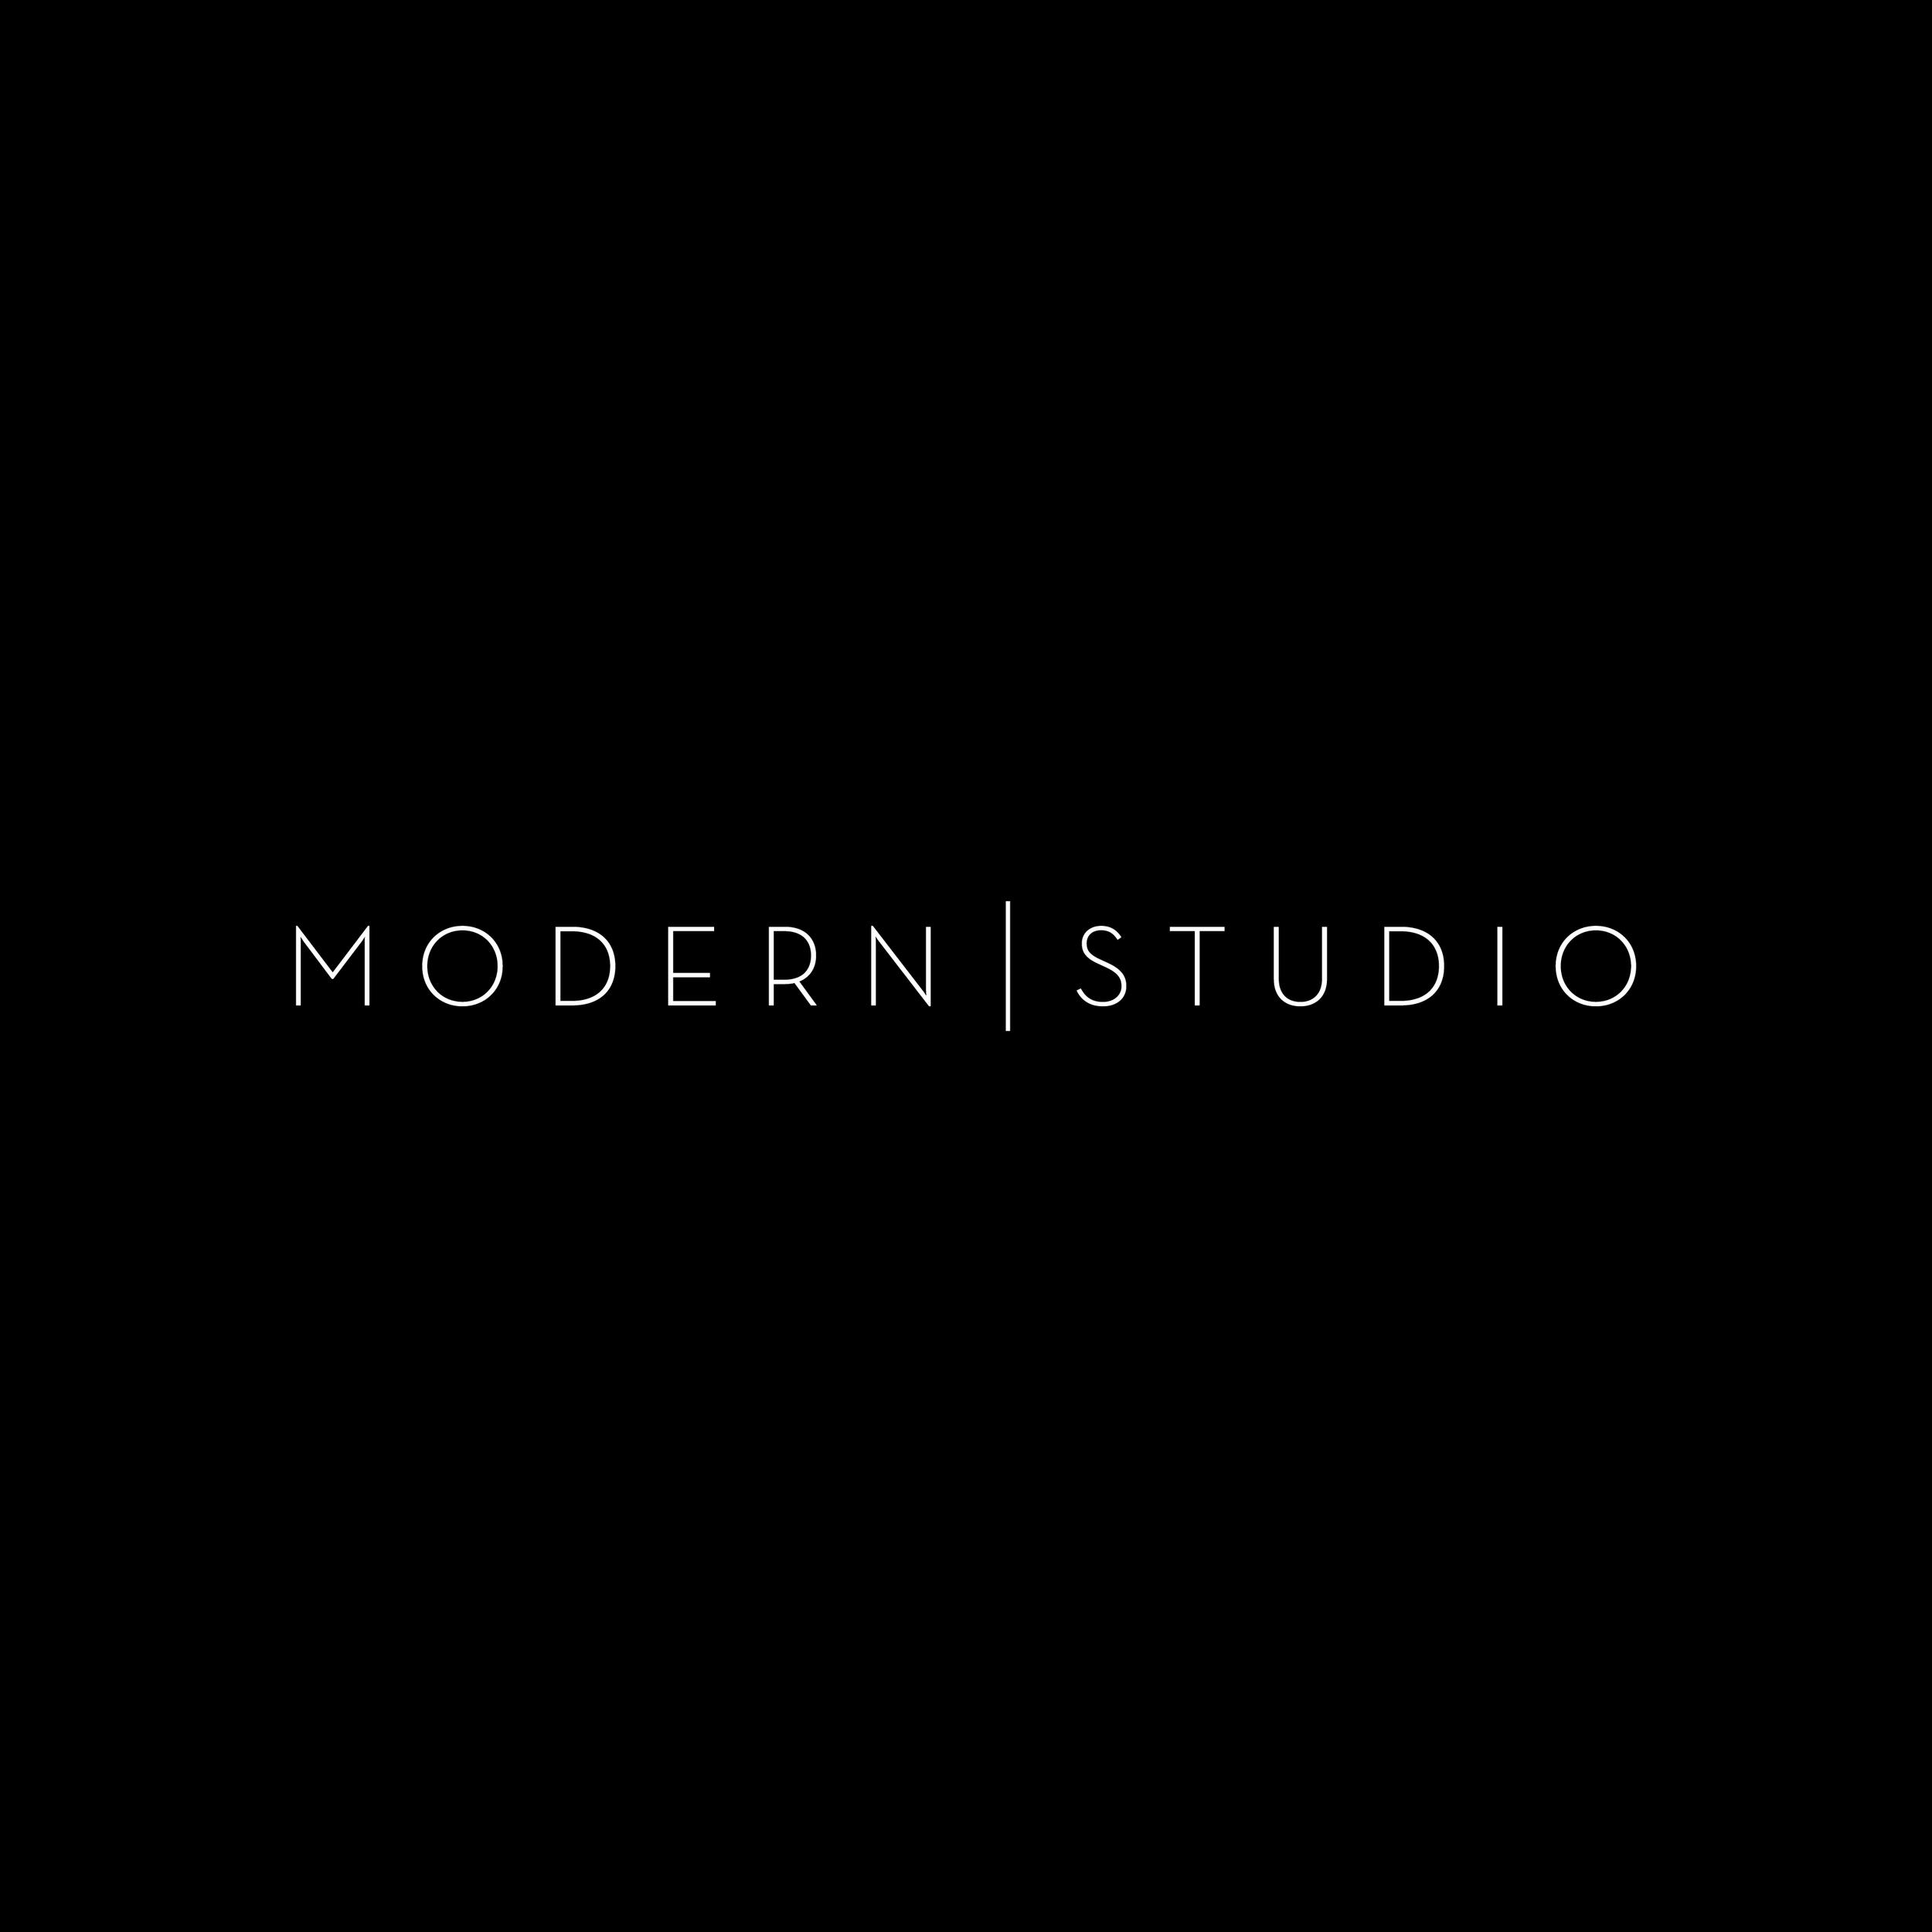 ModernStudio_FinalBranding_social3.png